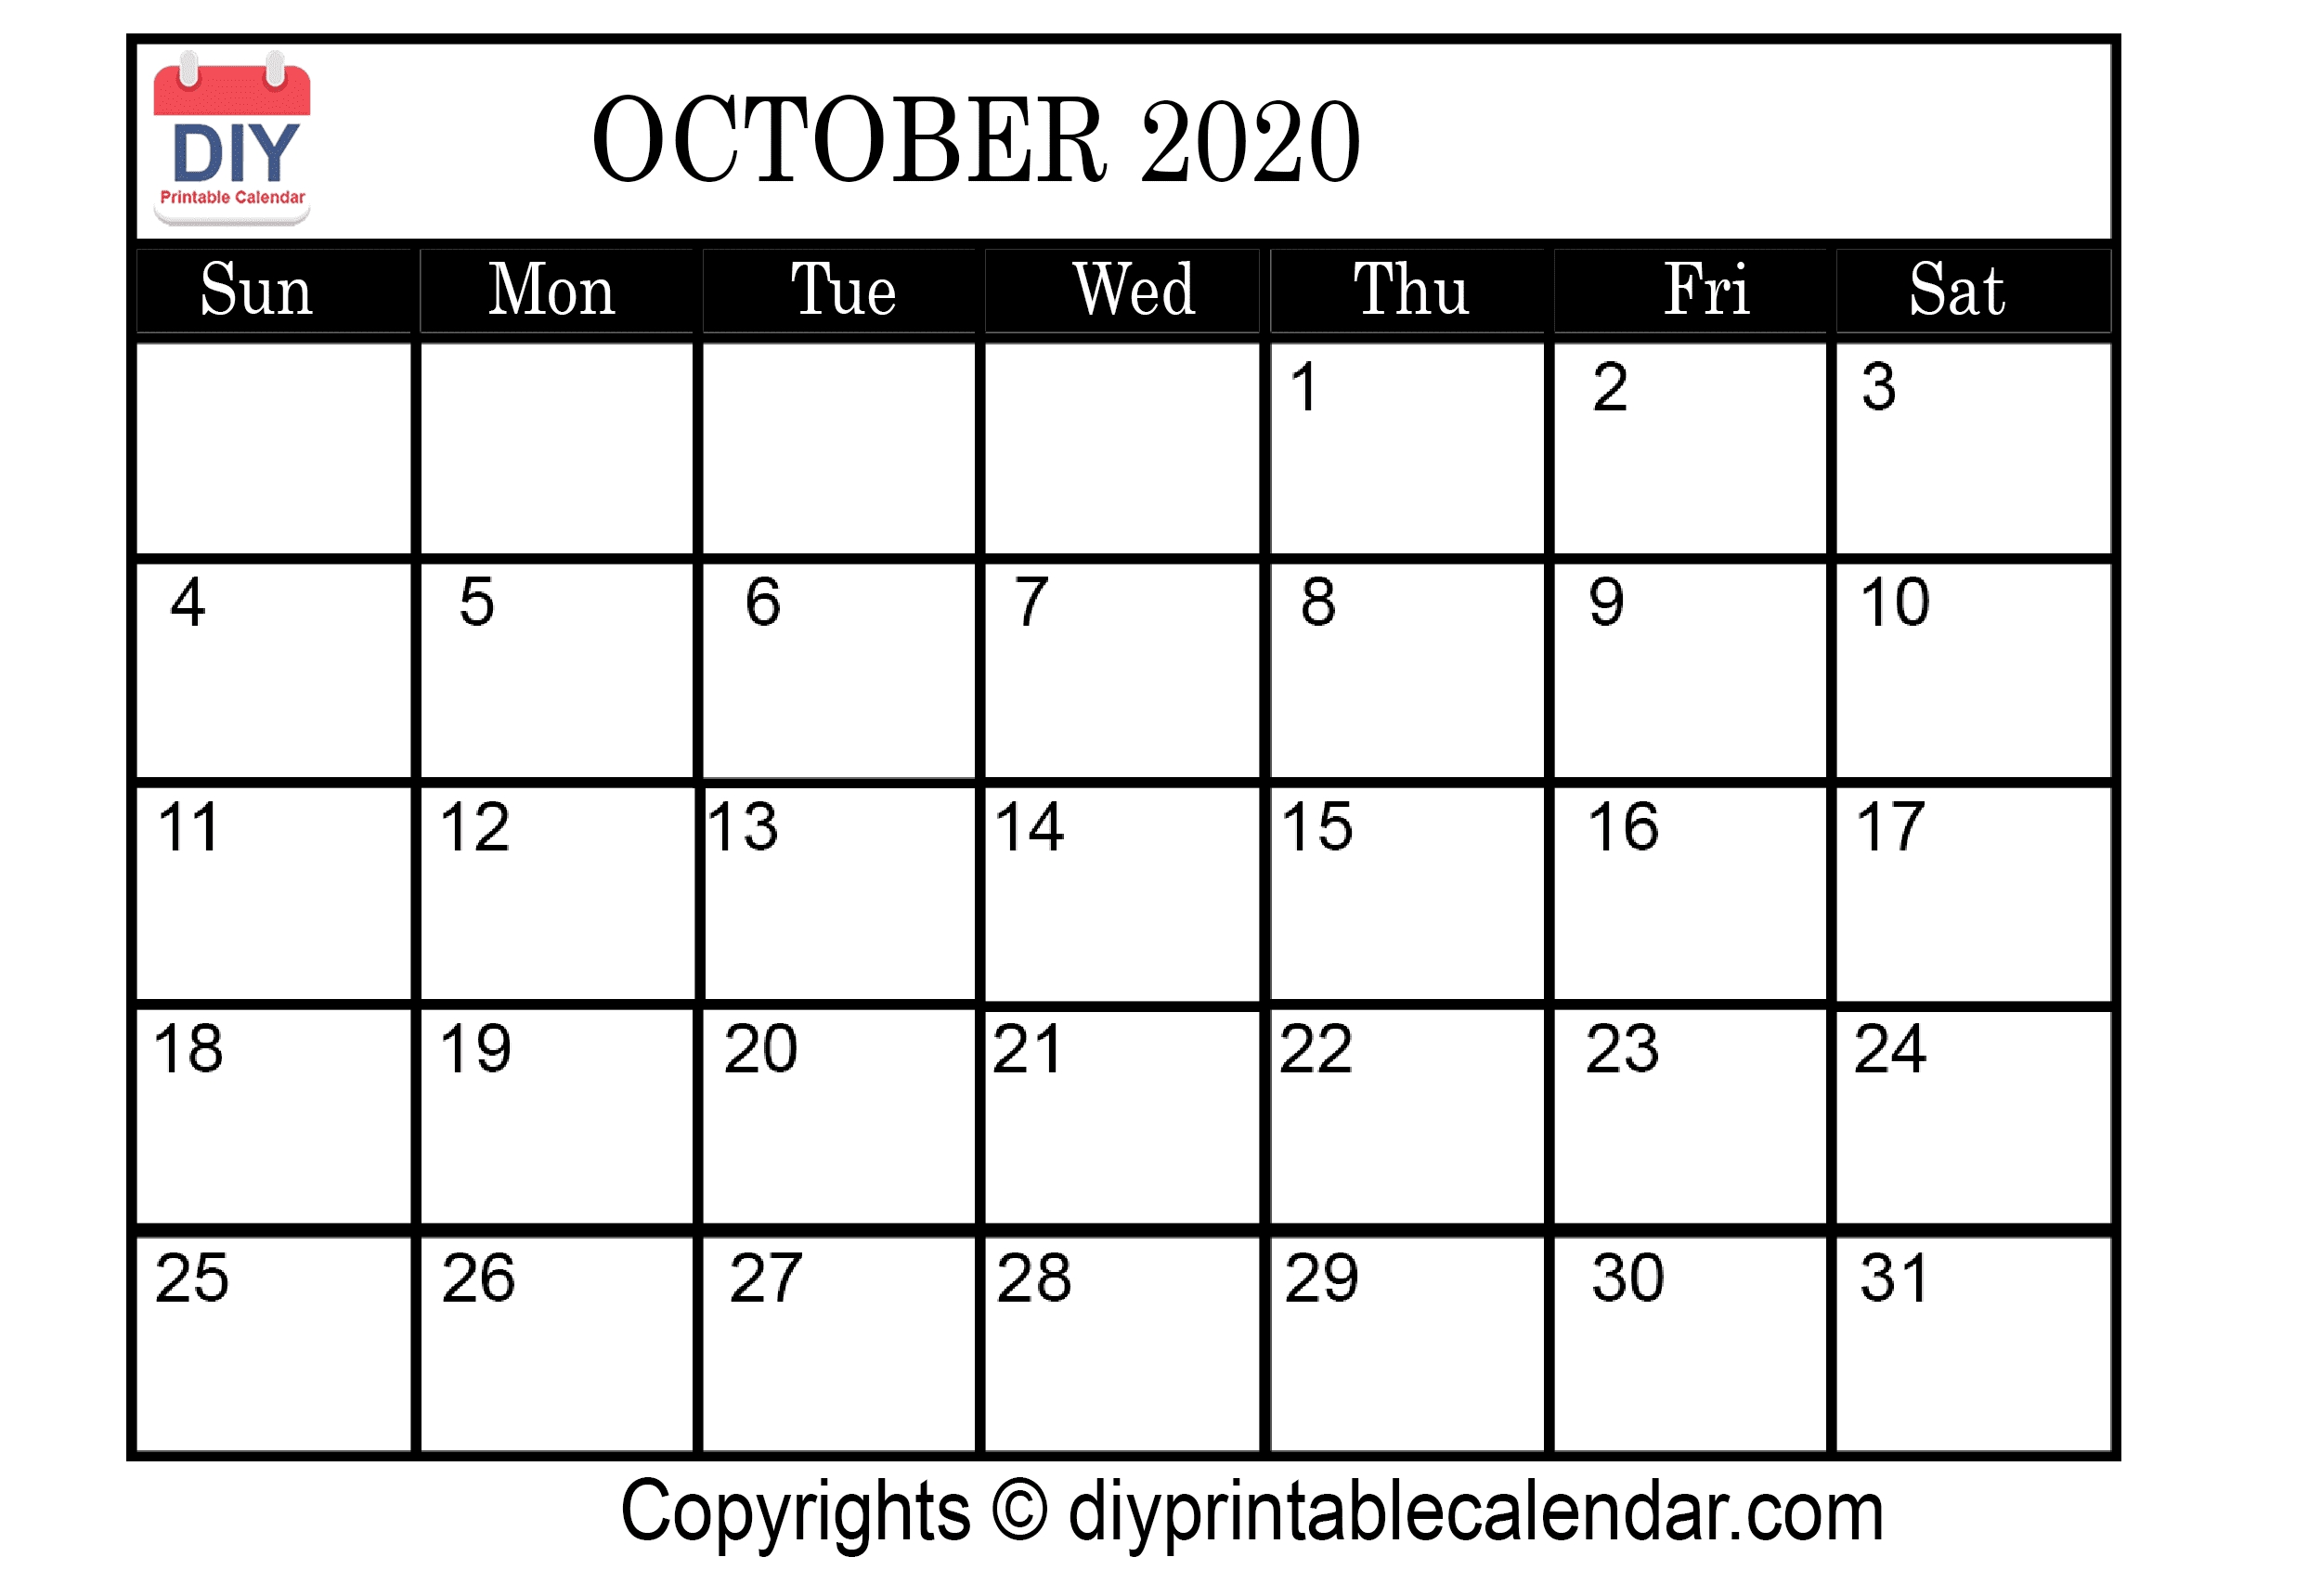 October 2020 Printable Calendar Template-2020 August September Octobercalendar Monthly